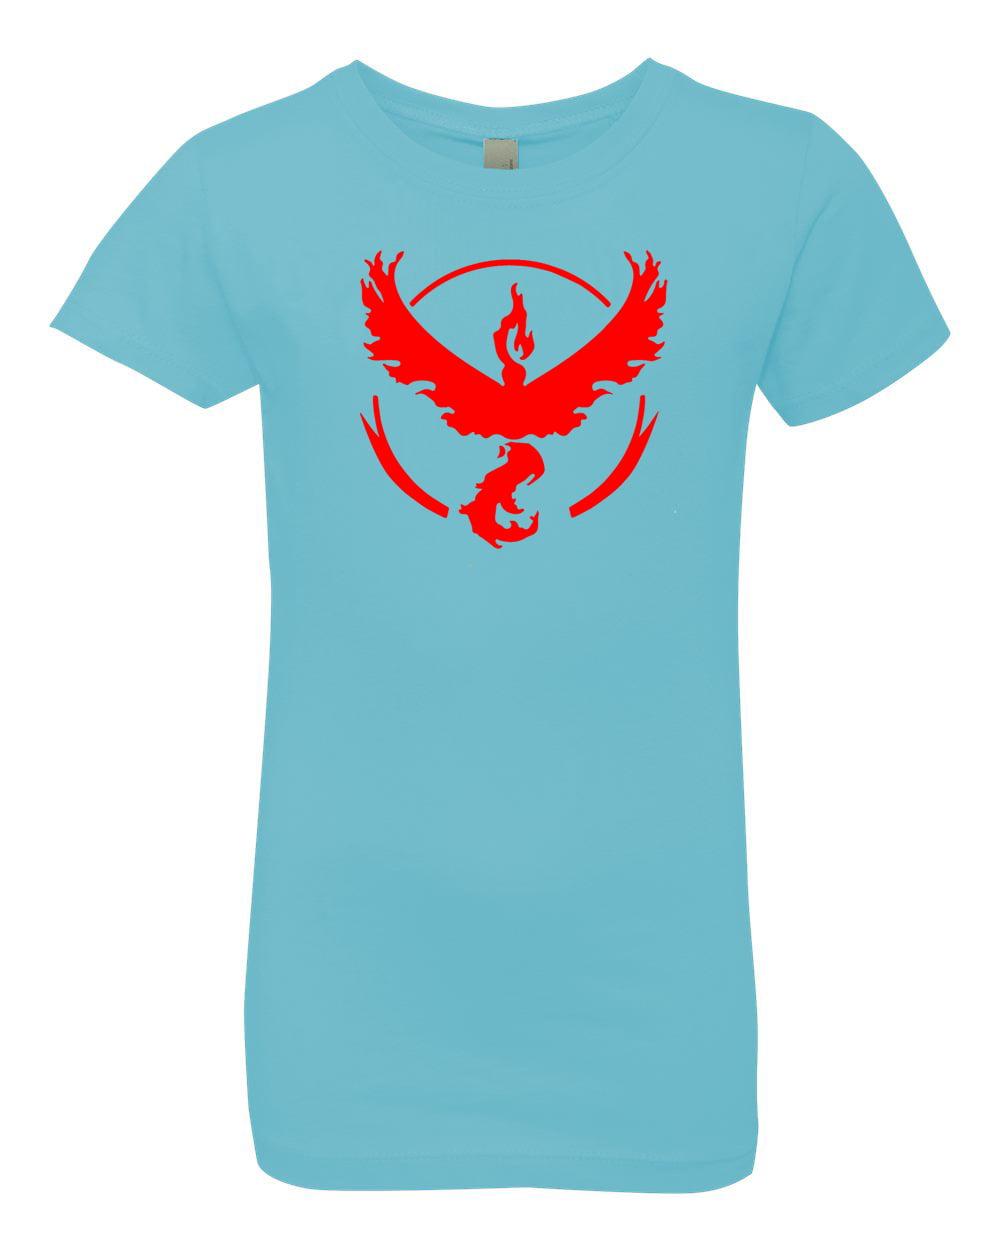 Pokemon Go Gym Team Valor Red Youth Girls Princess Tee T-Shirt Top